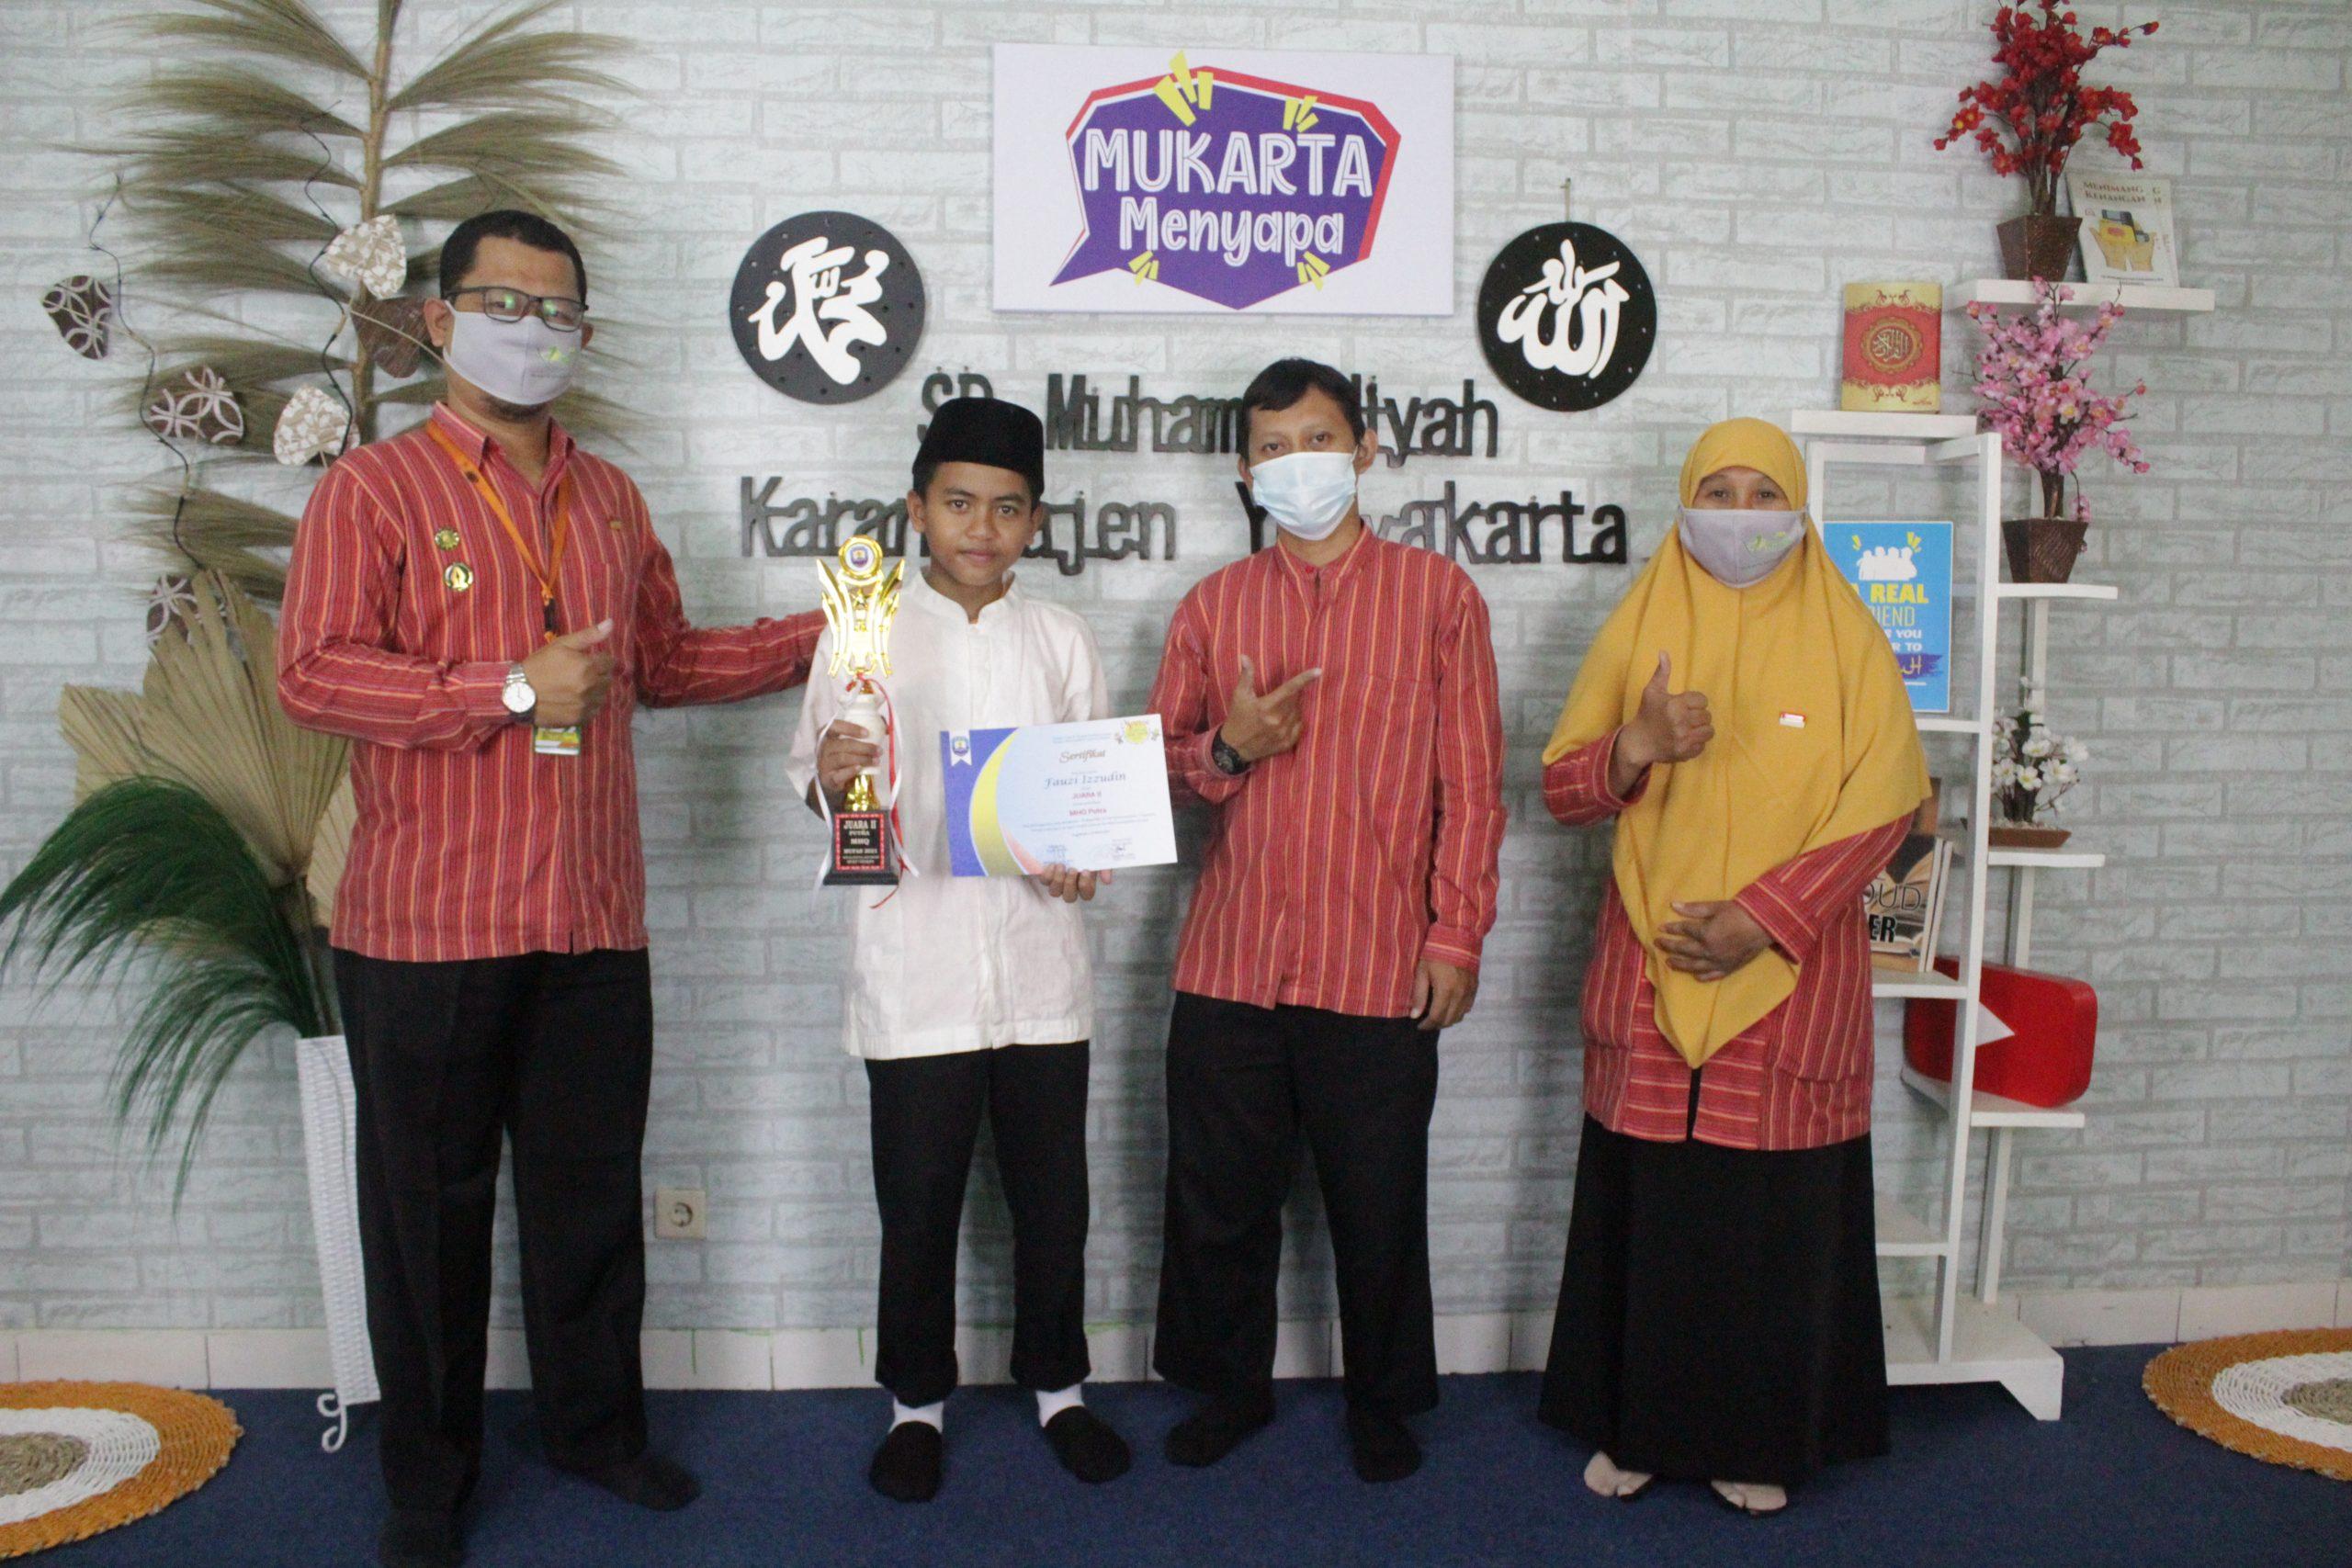 Juara 2 Lomba MHQ SMP Muhammadiyah 7 Yogyakarta